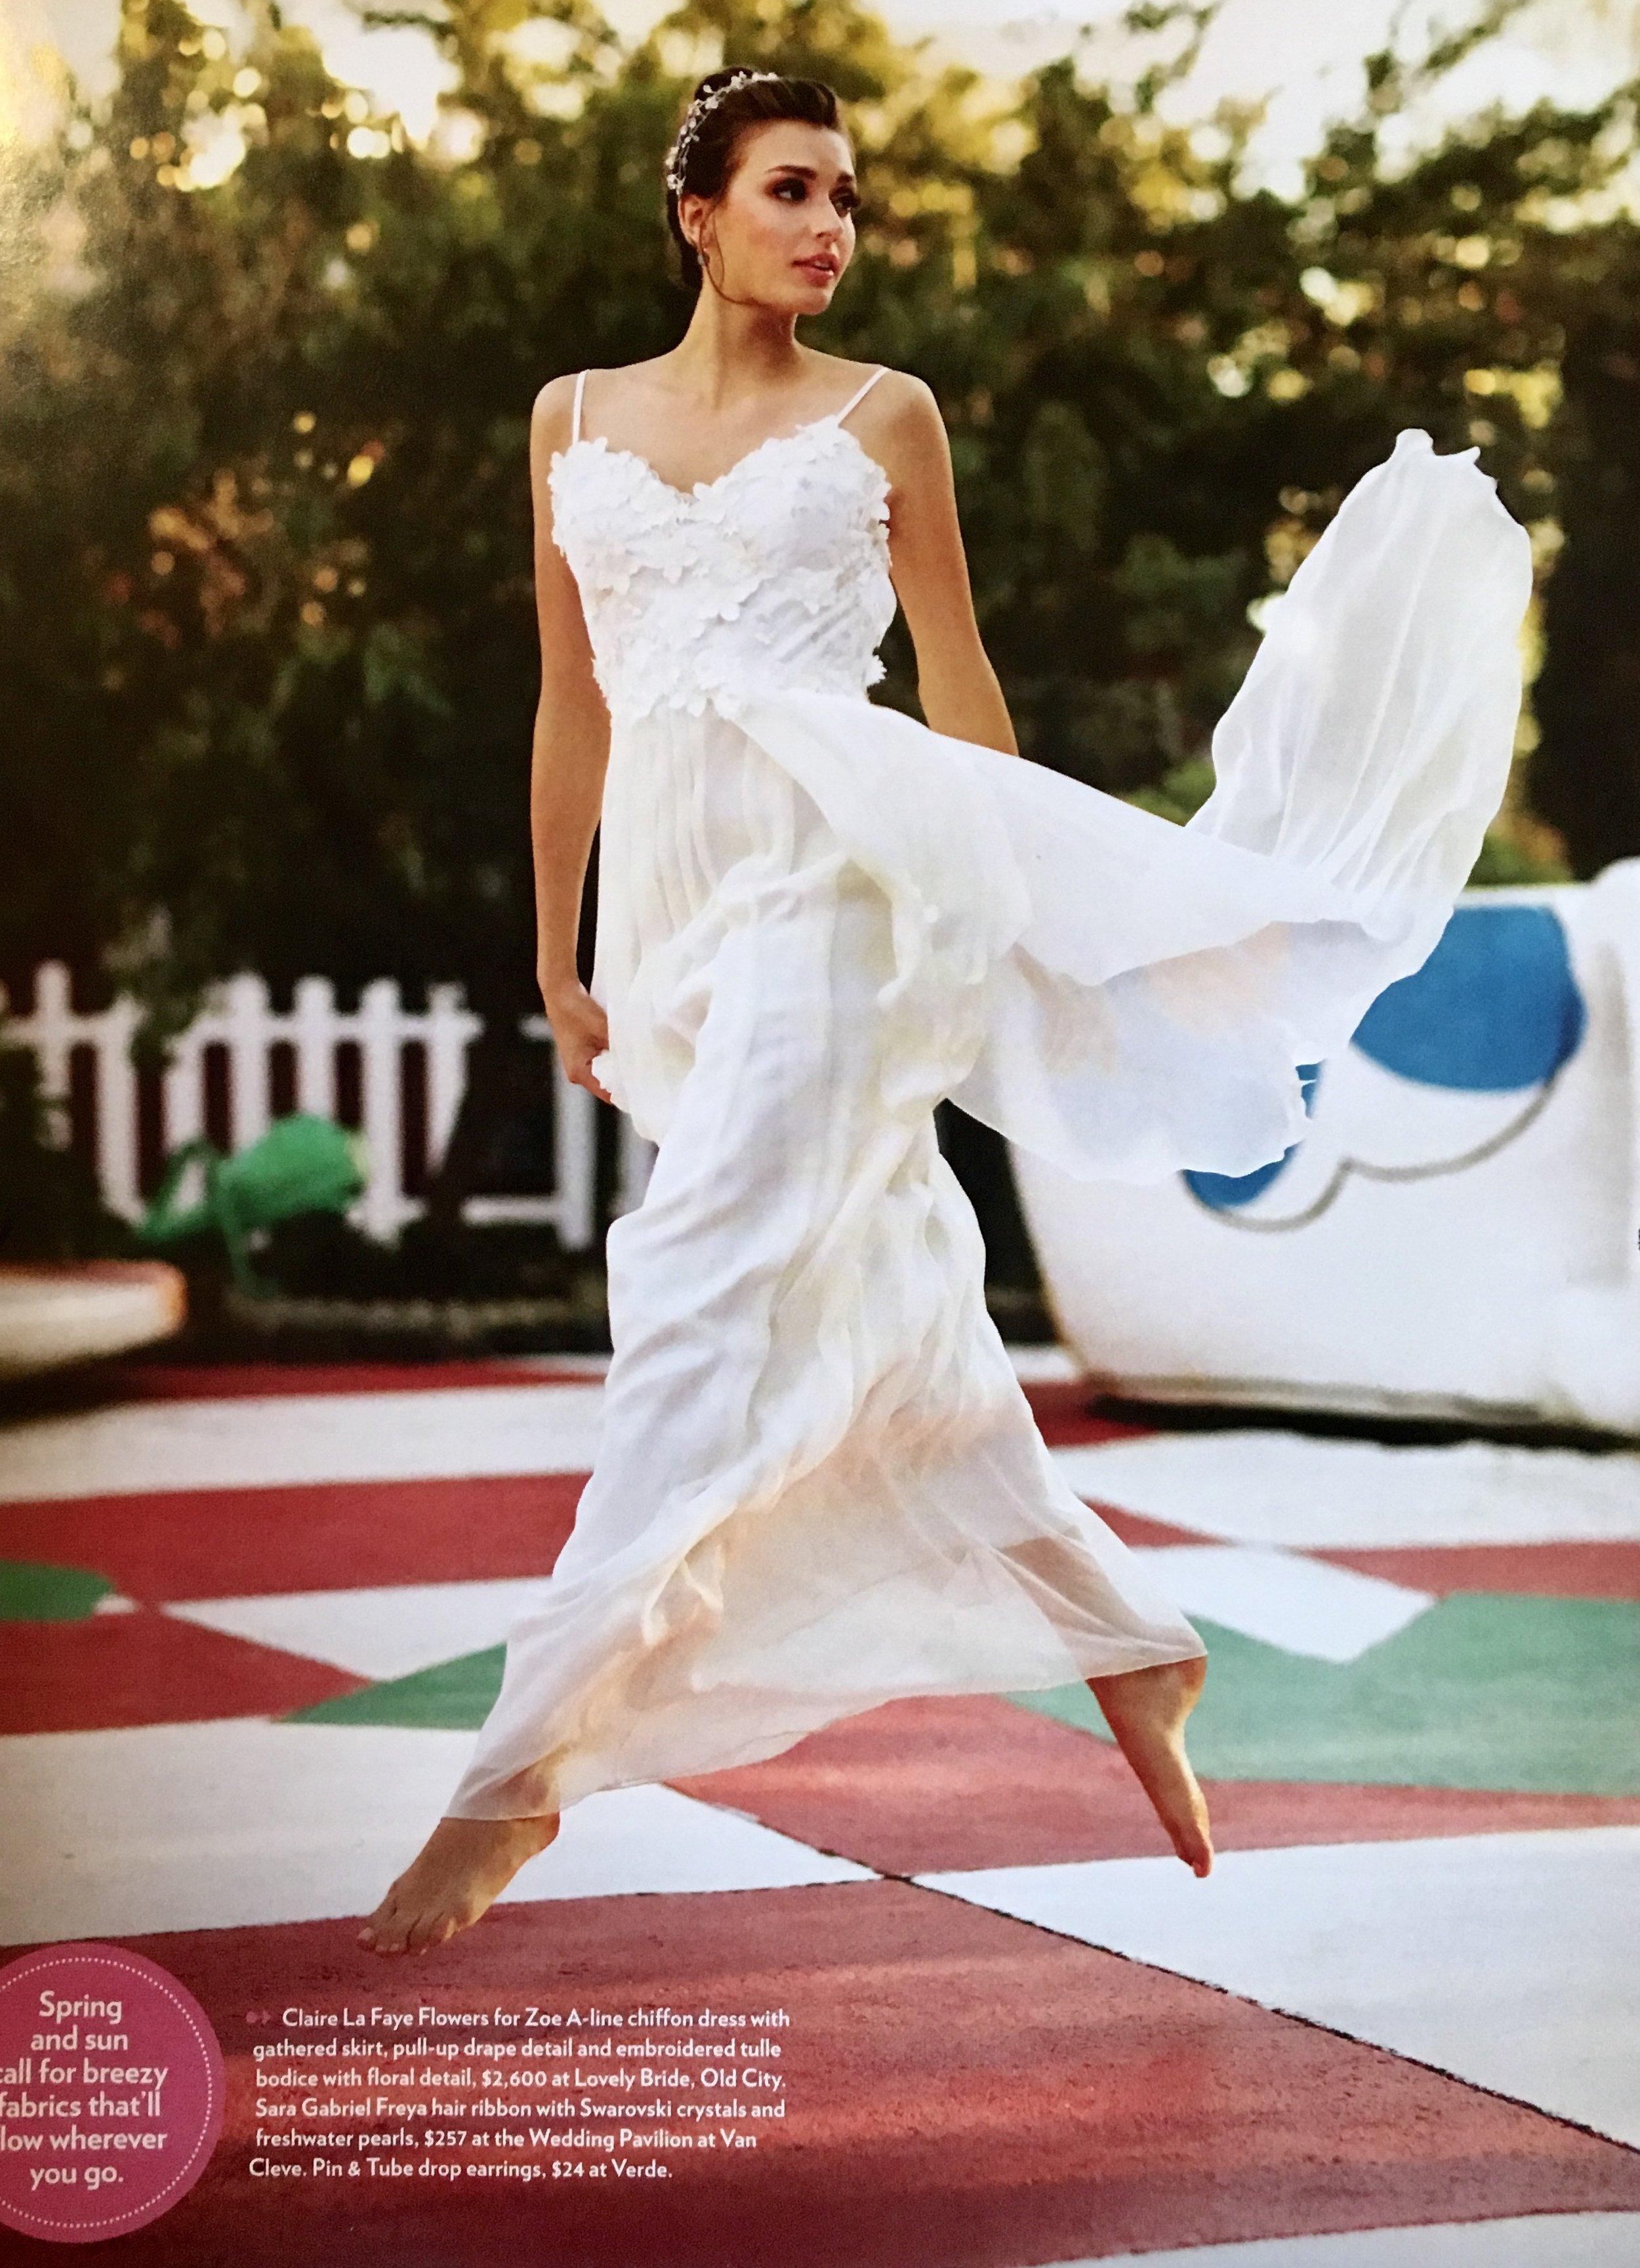 Philadelphia Wedding - Spring/Summer 2016